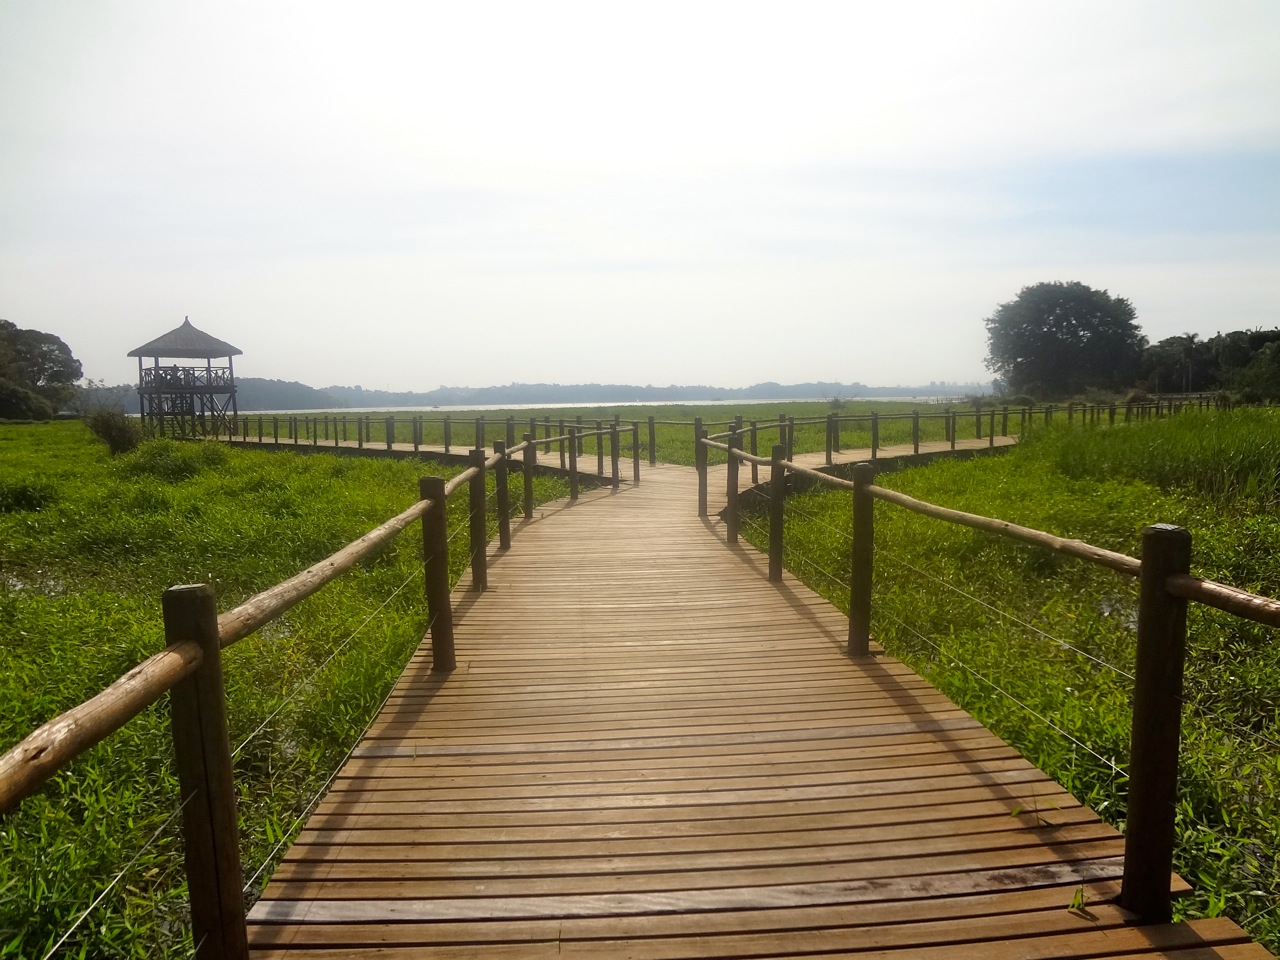 Parque Linear Castelo